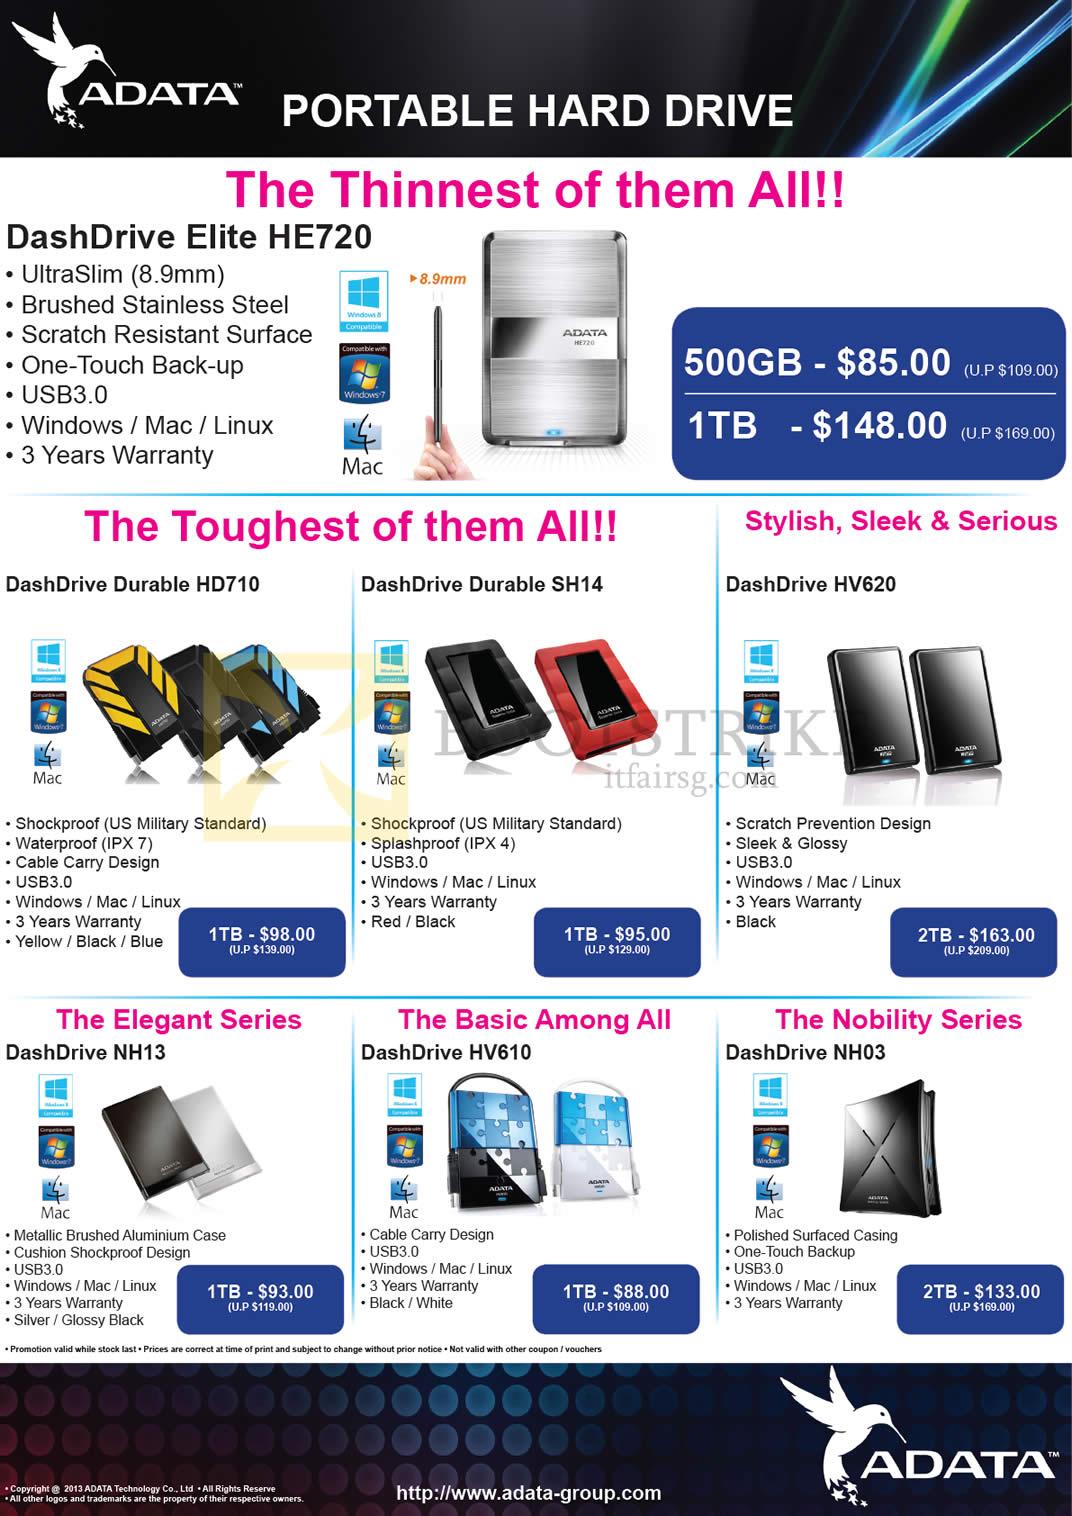 COMEX 2013 price list image brochure of The Perpetuity Adata External Storage DashDrive Elite HE720, Durable HD710, SH14, HV620, NH13, HV610, NH03 1TB 2TB